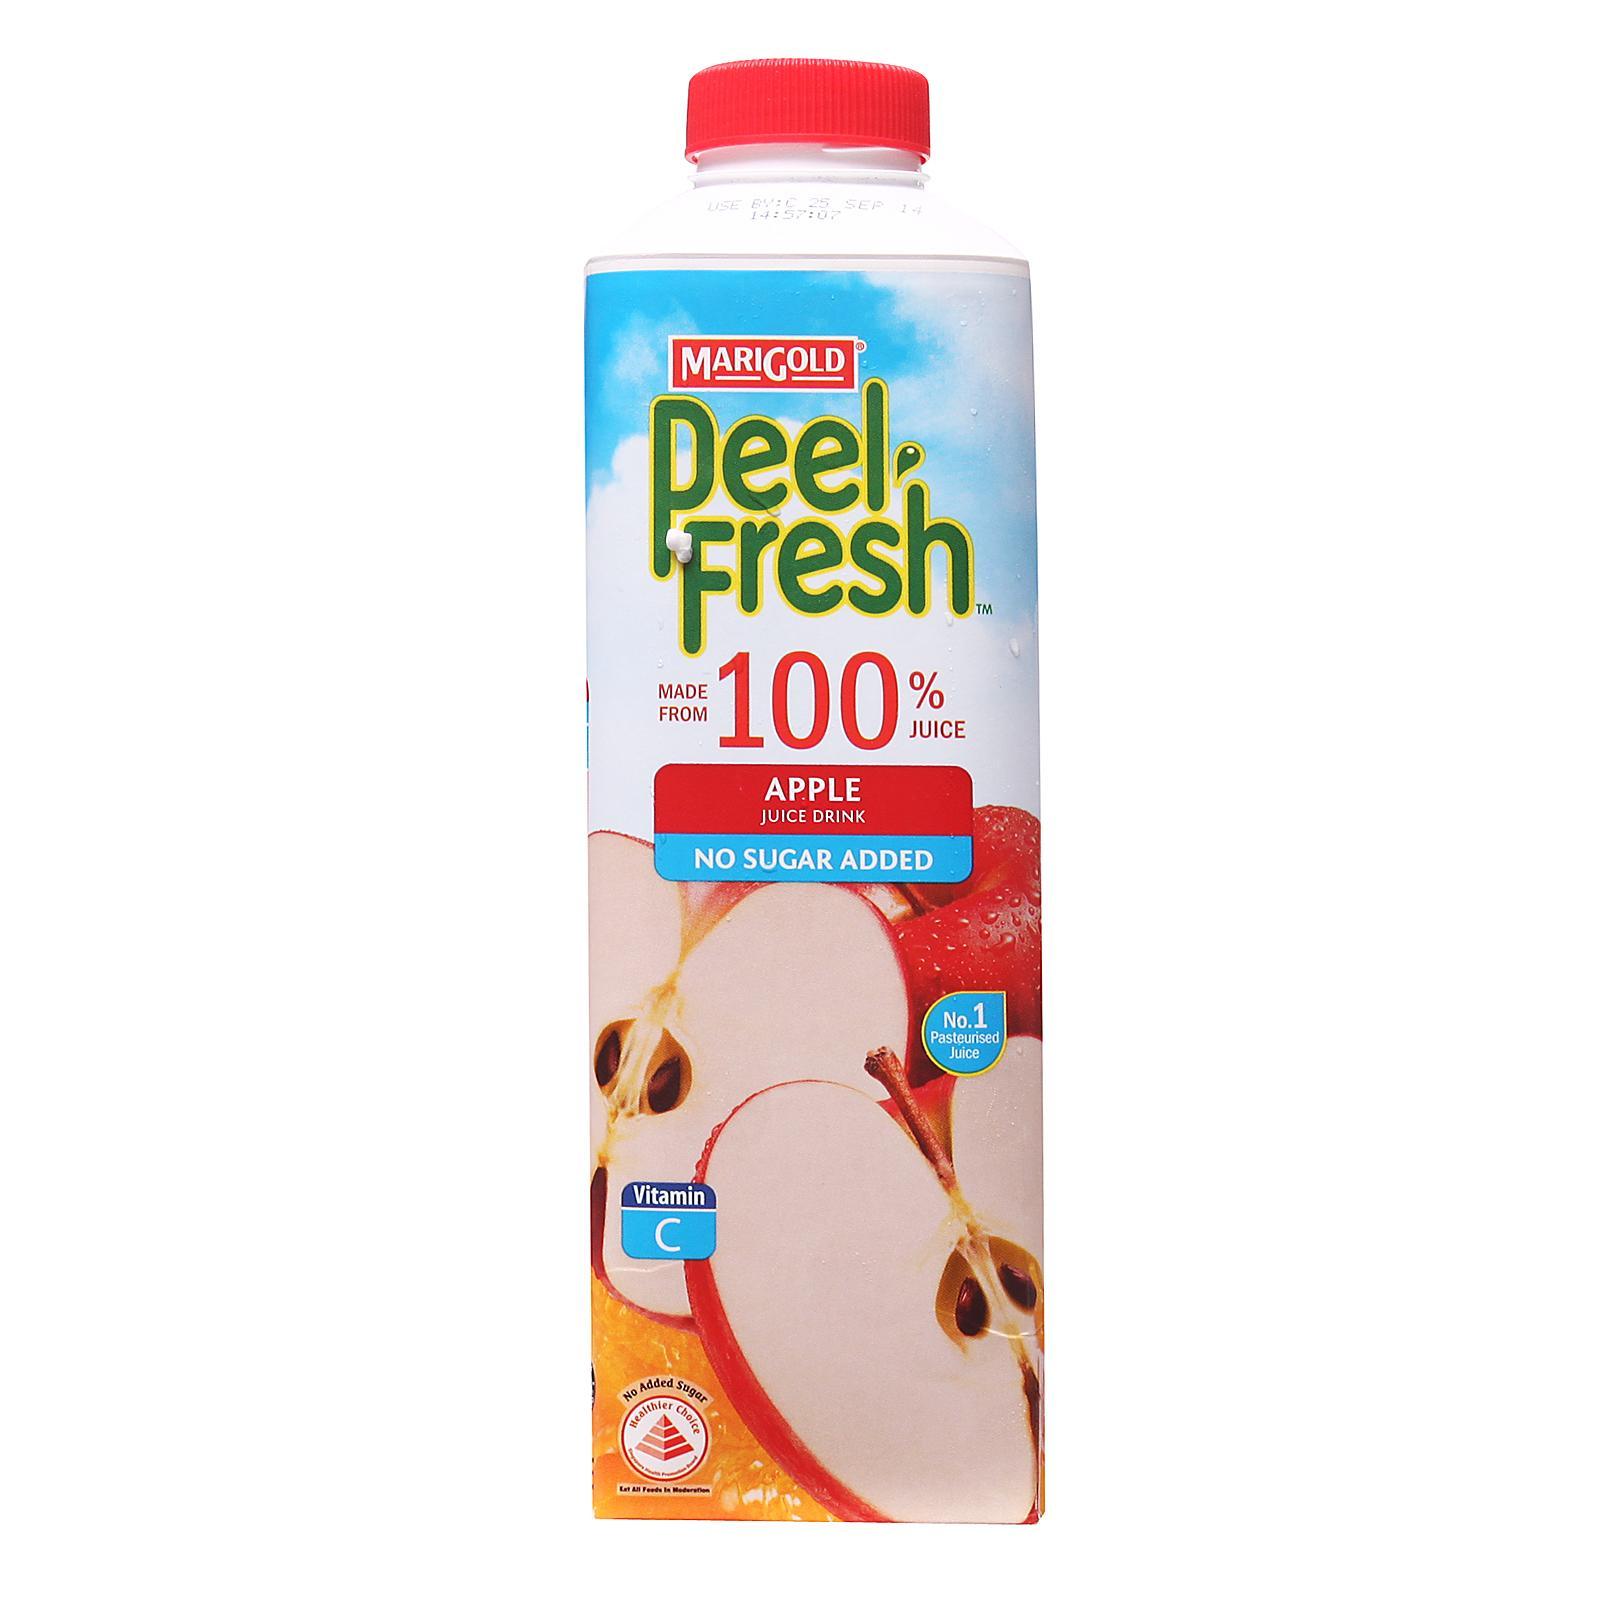 MARIGOLD Peel Fresh No Sugar Added Juice Drink - Apple